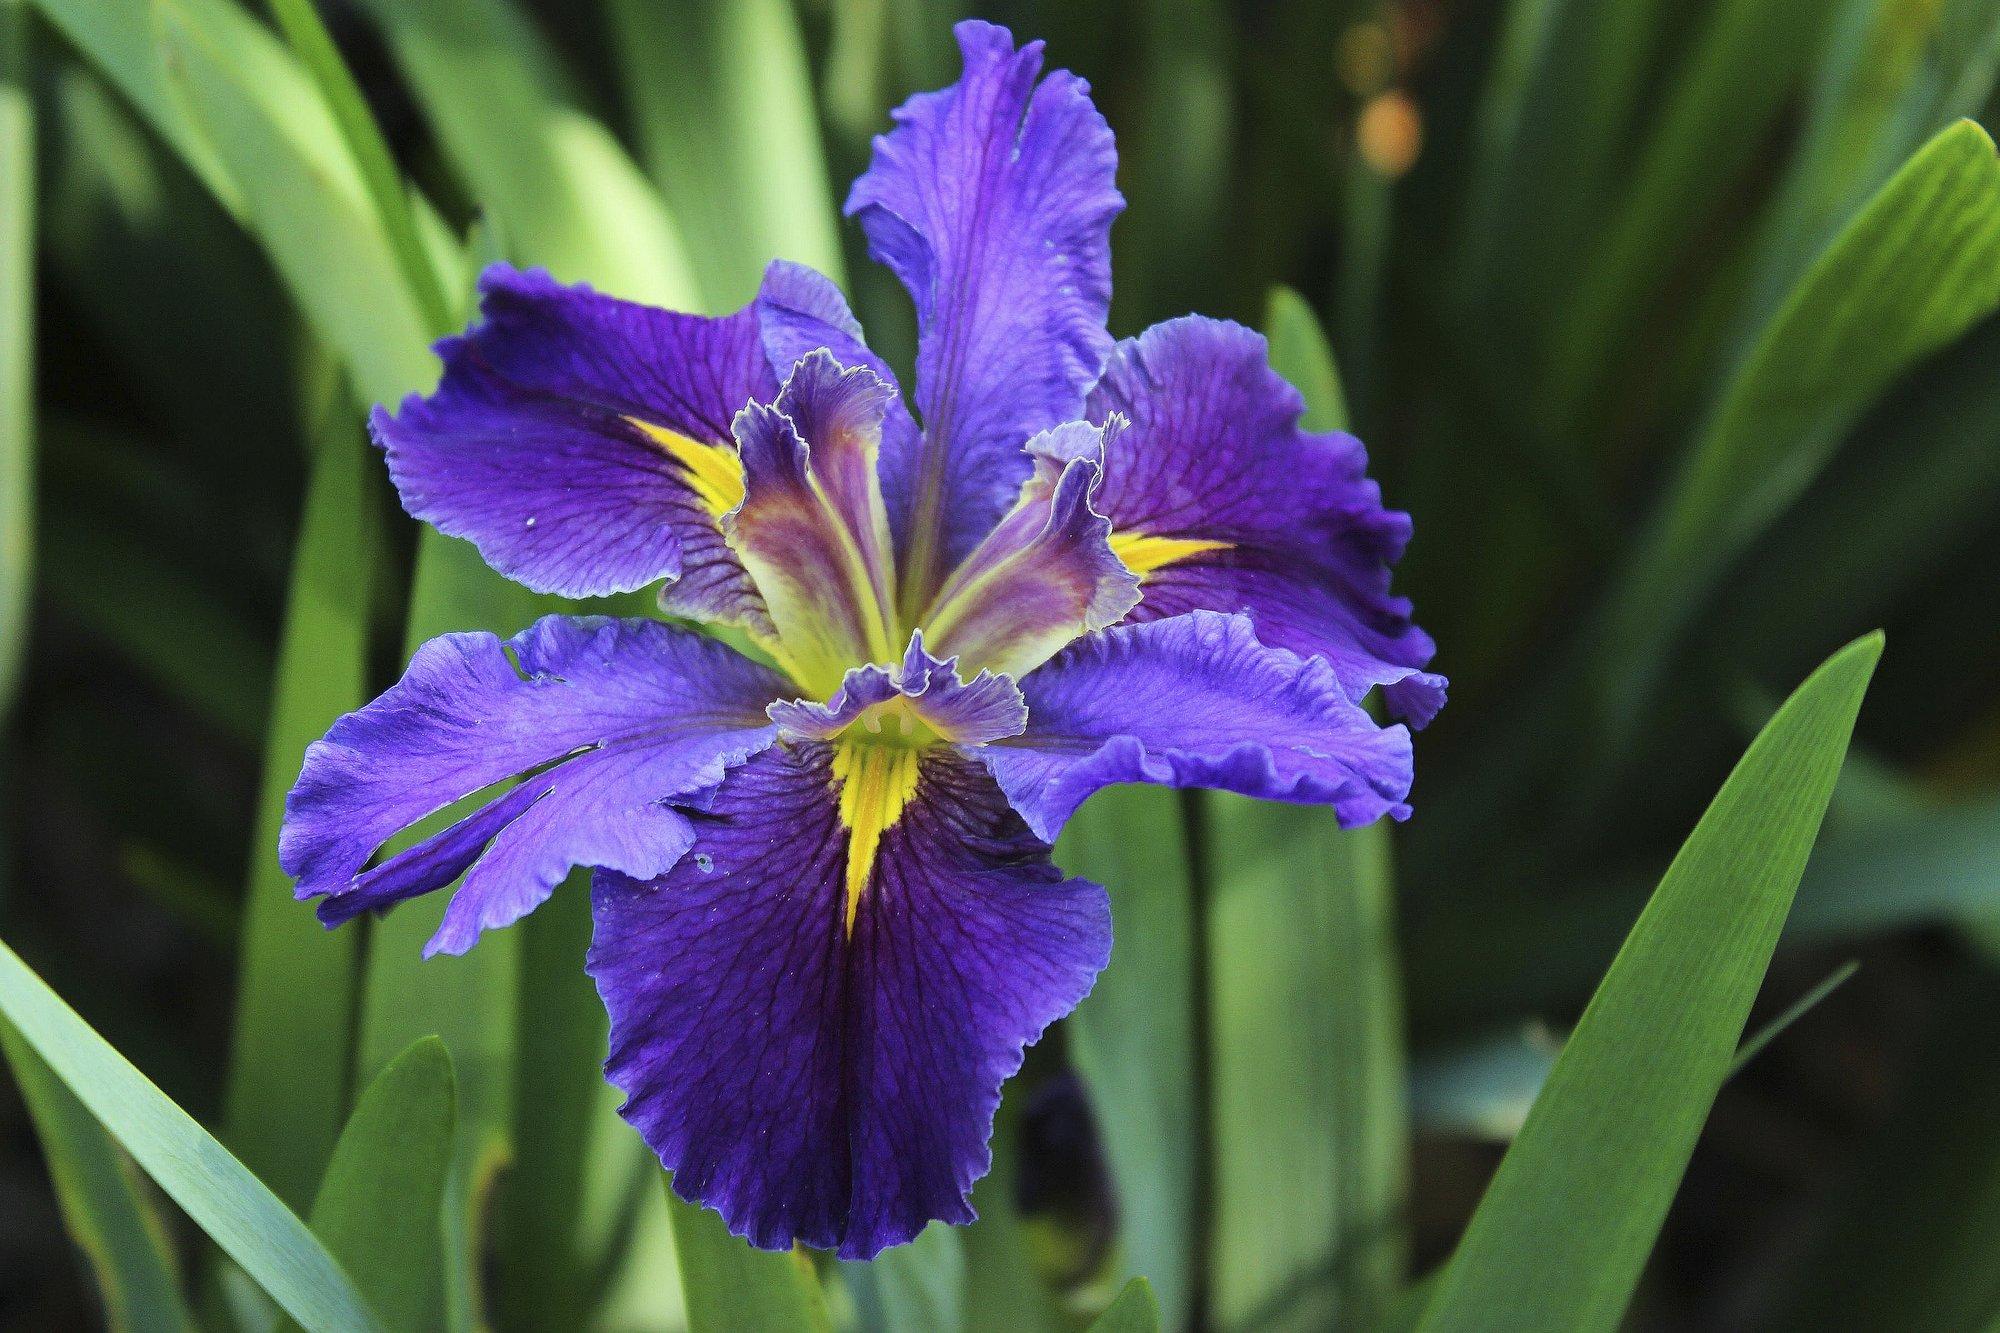 Petal Power Group Works To Preserve Wild Louisiana Irises